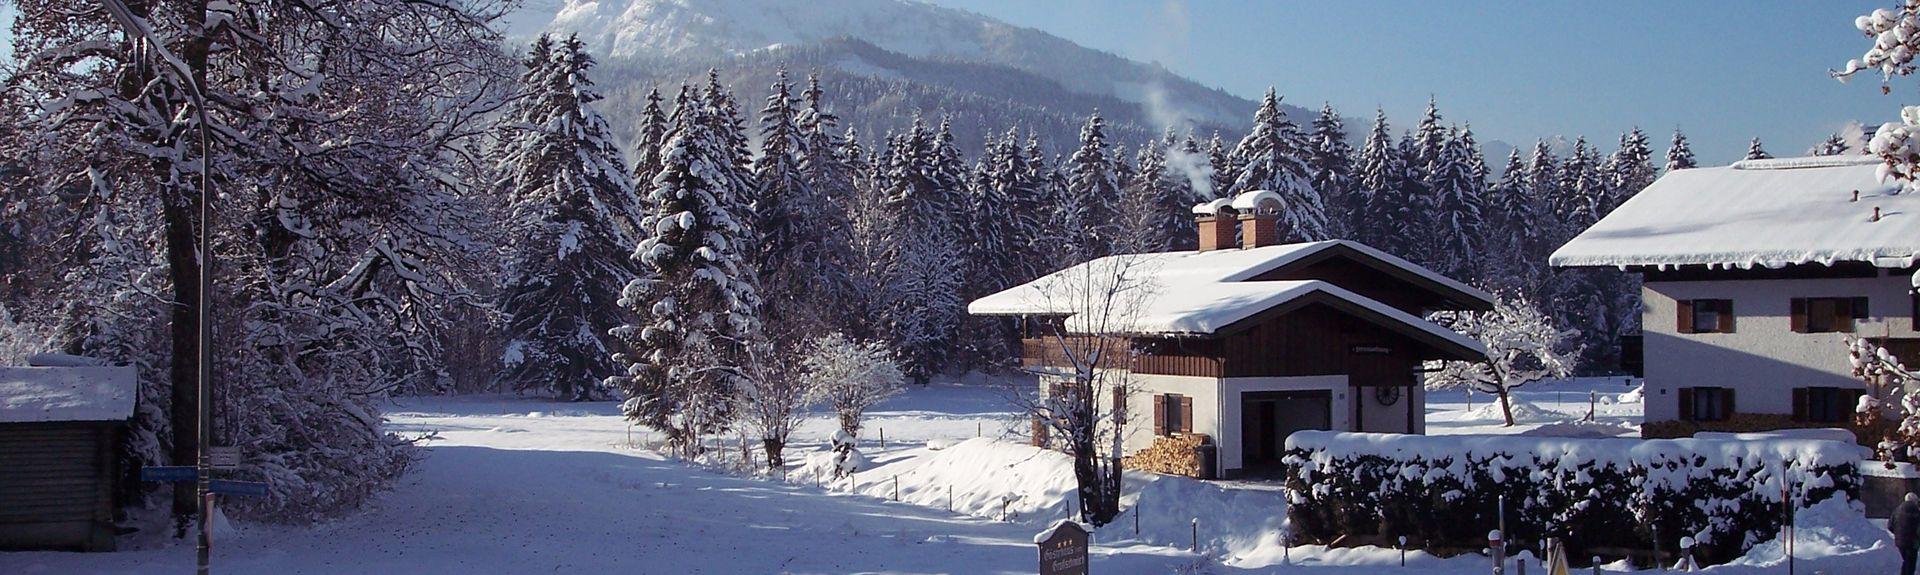 Aschau im Chiemgau, Bavaria, Germany